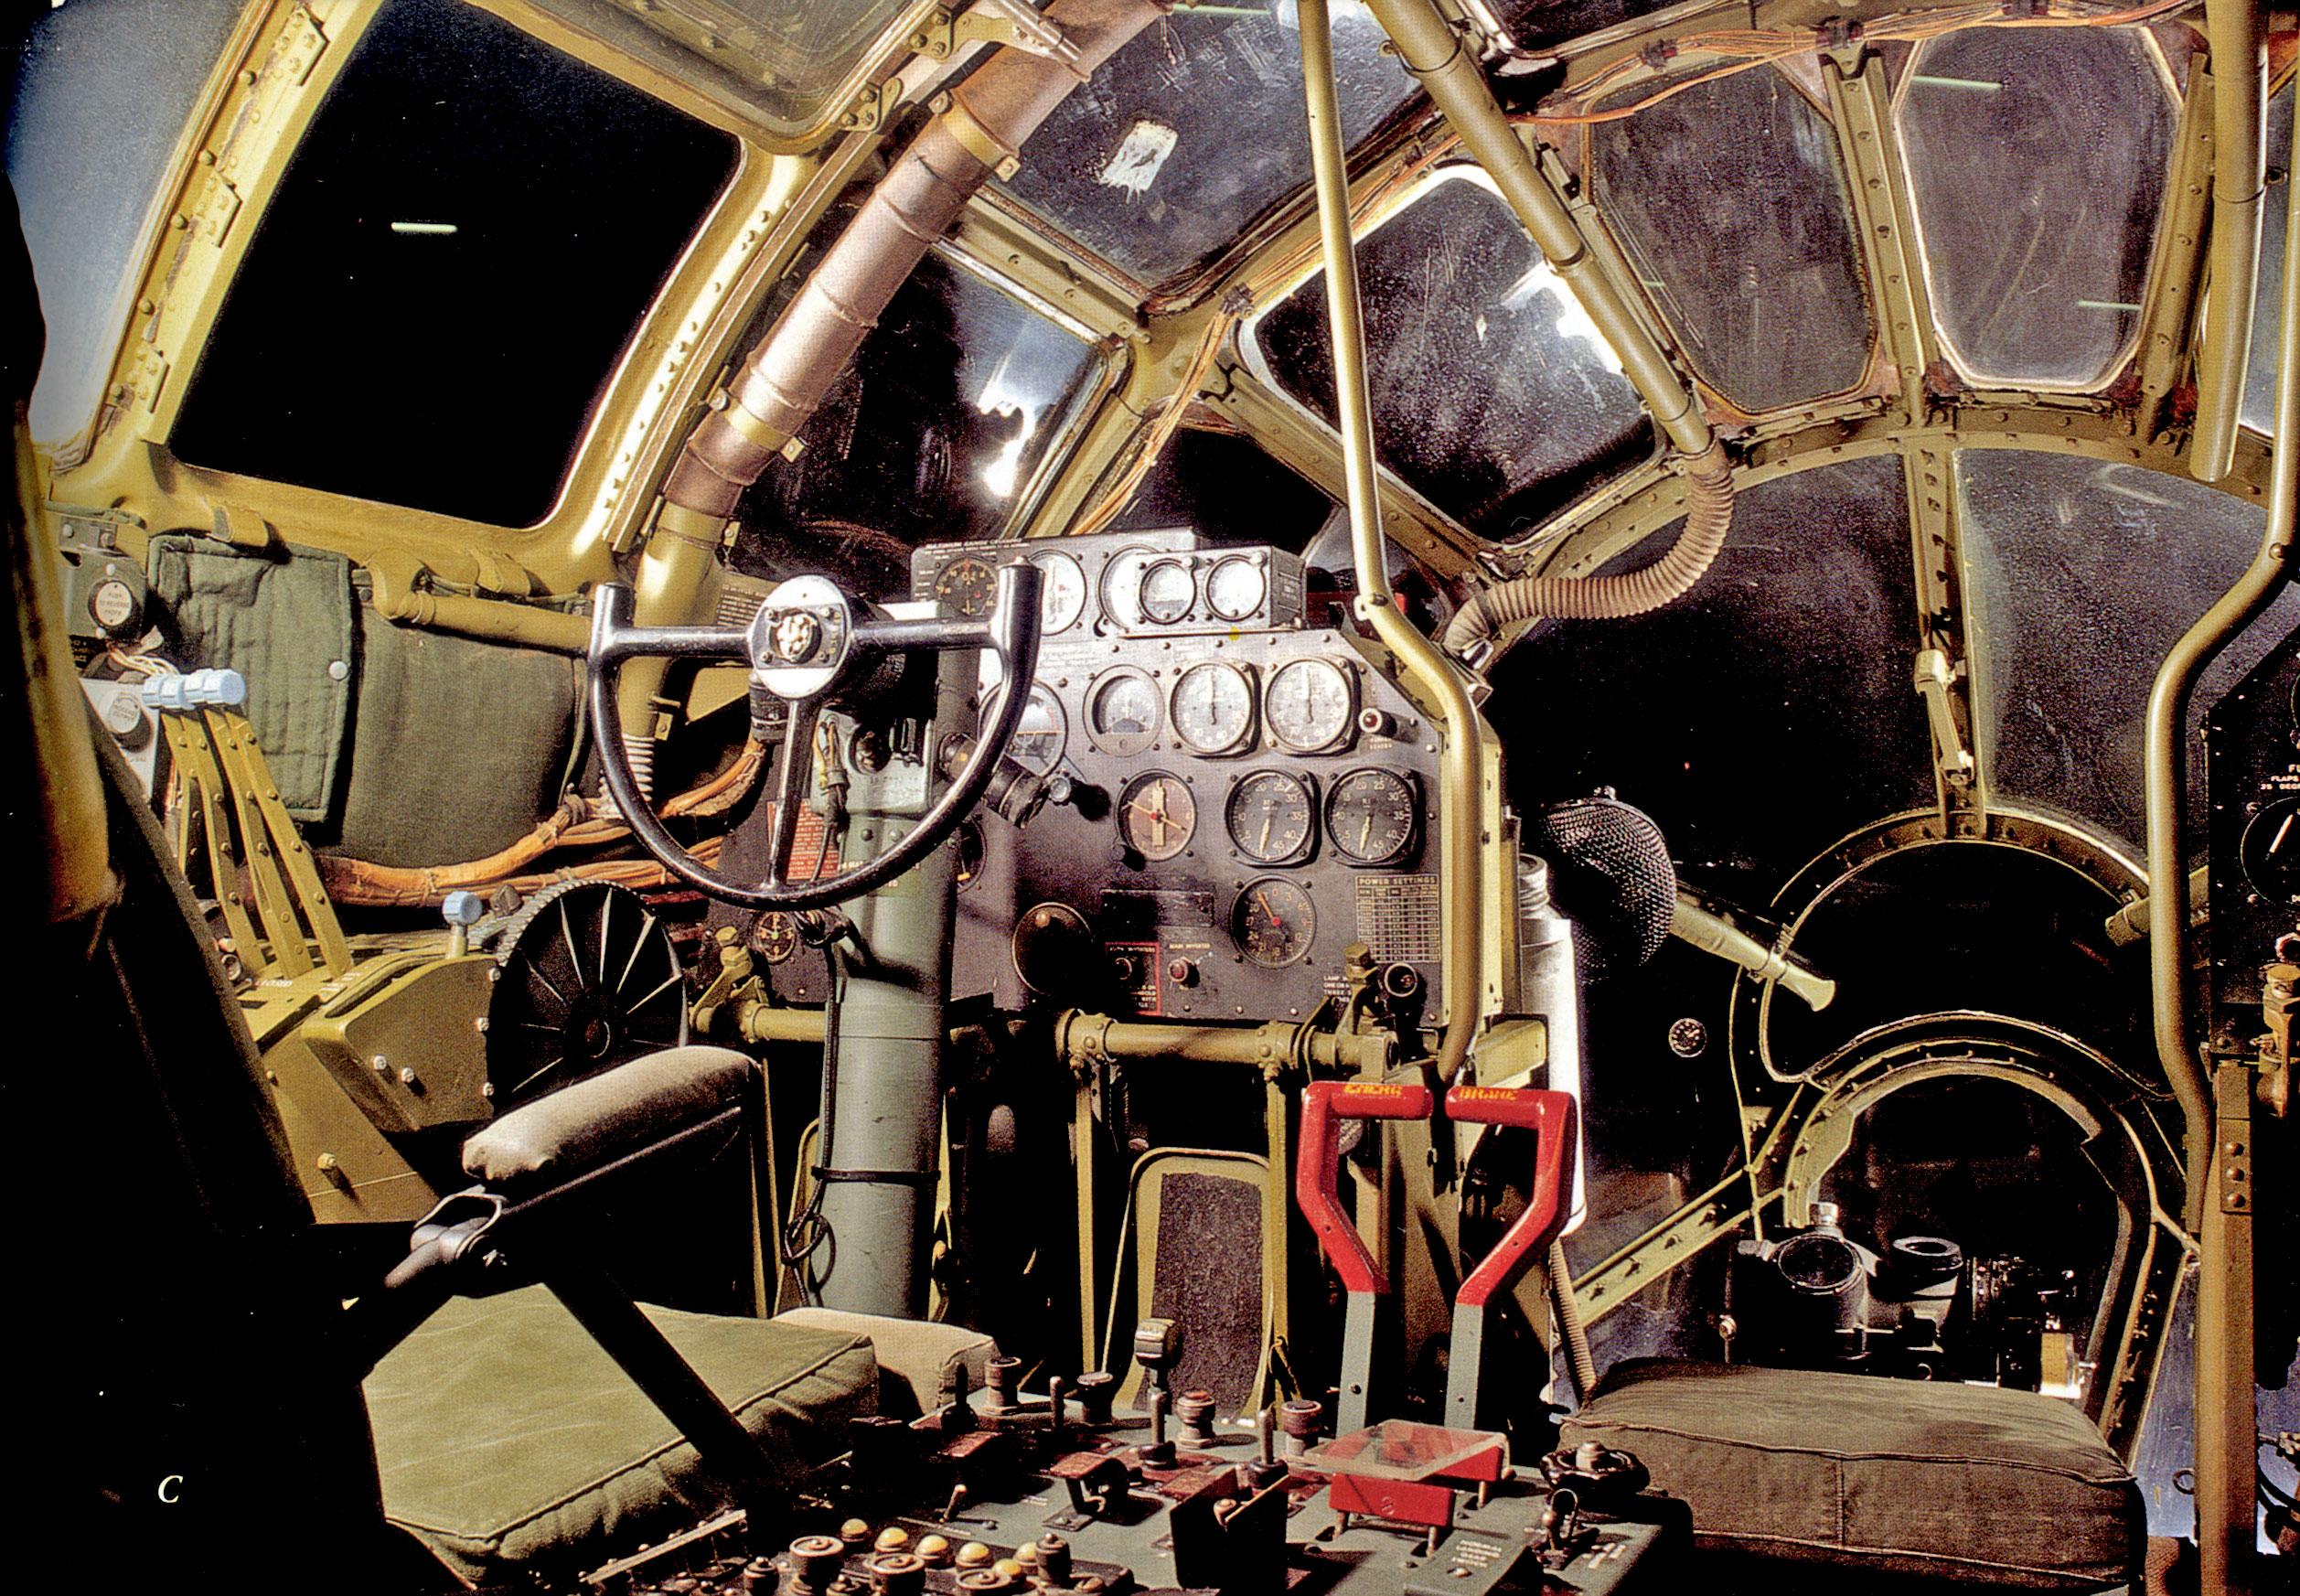 B 29 (航空機)の画像 p1_39